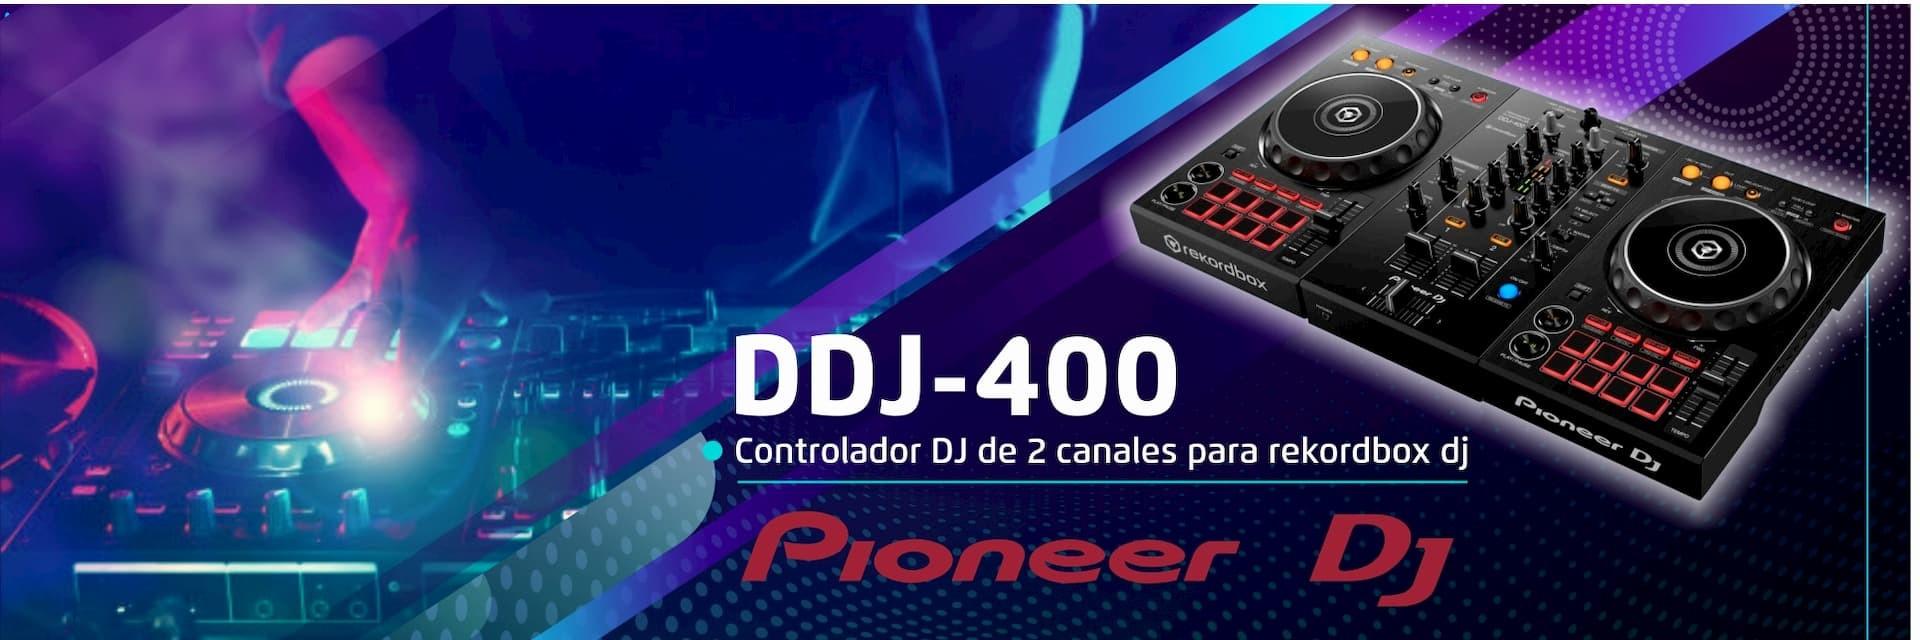 Controlador DJ de 2 canales para rekordbox dj